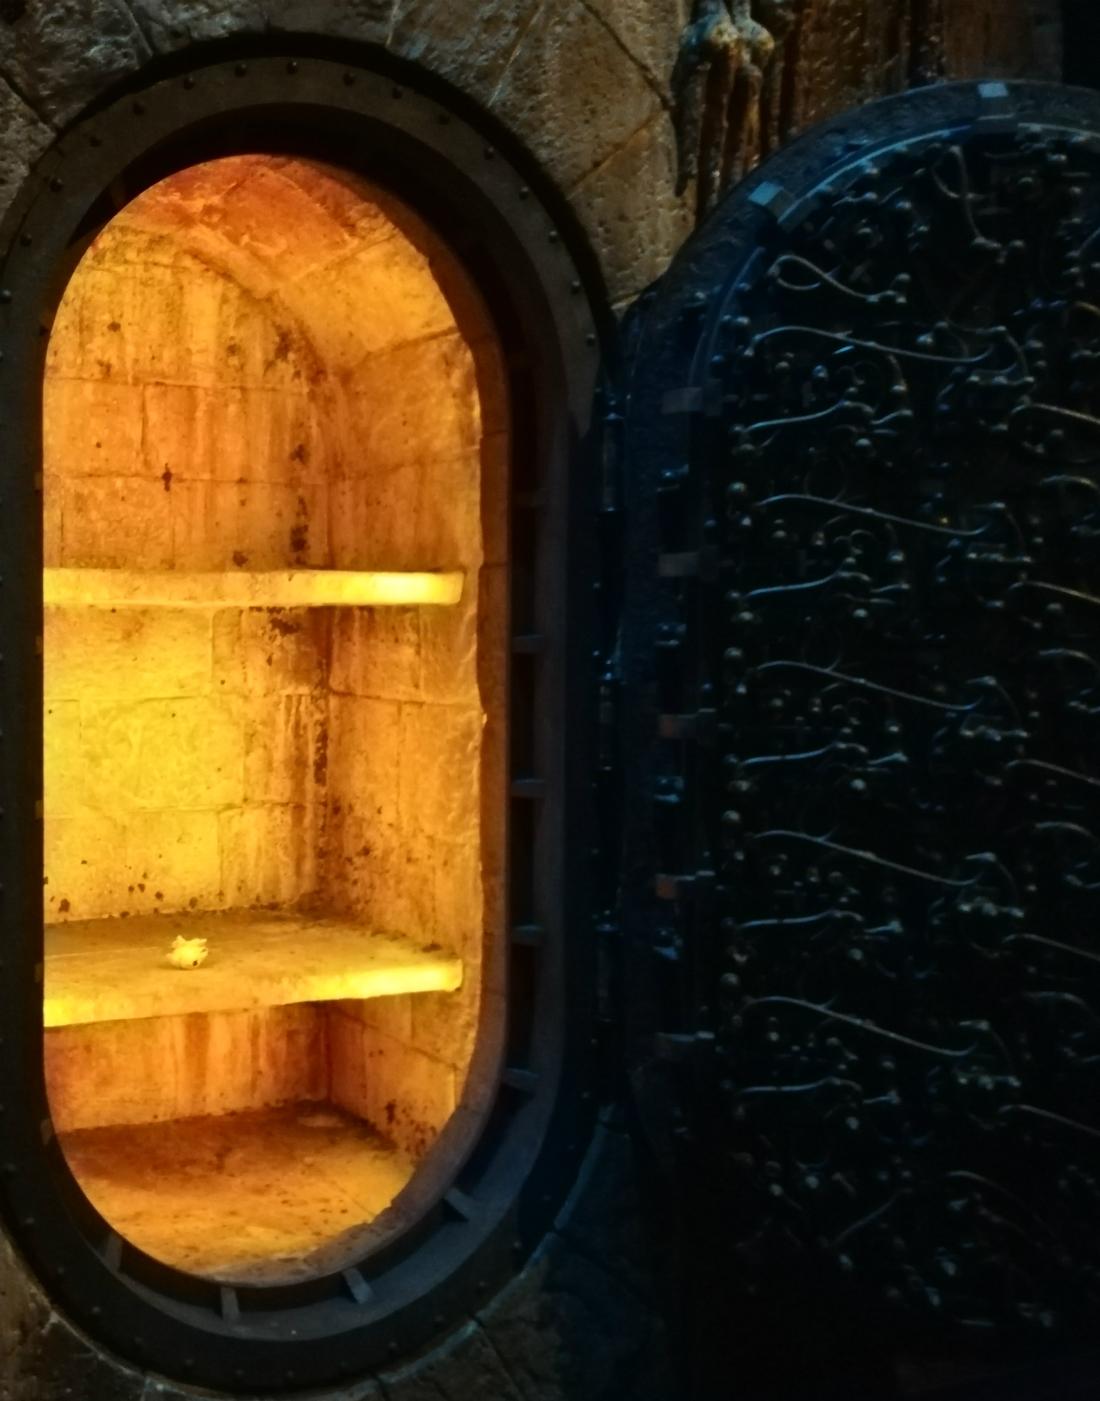 Gringotts opening at Warner Bros Studio Tour – Vault 713 with the Sorcerer's Stone